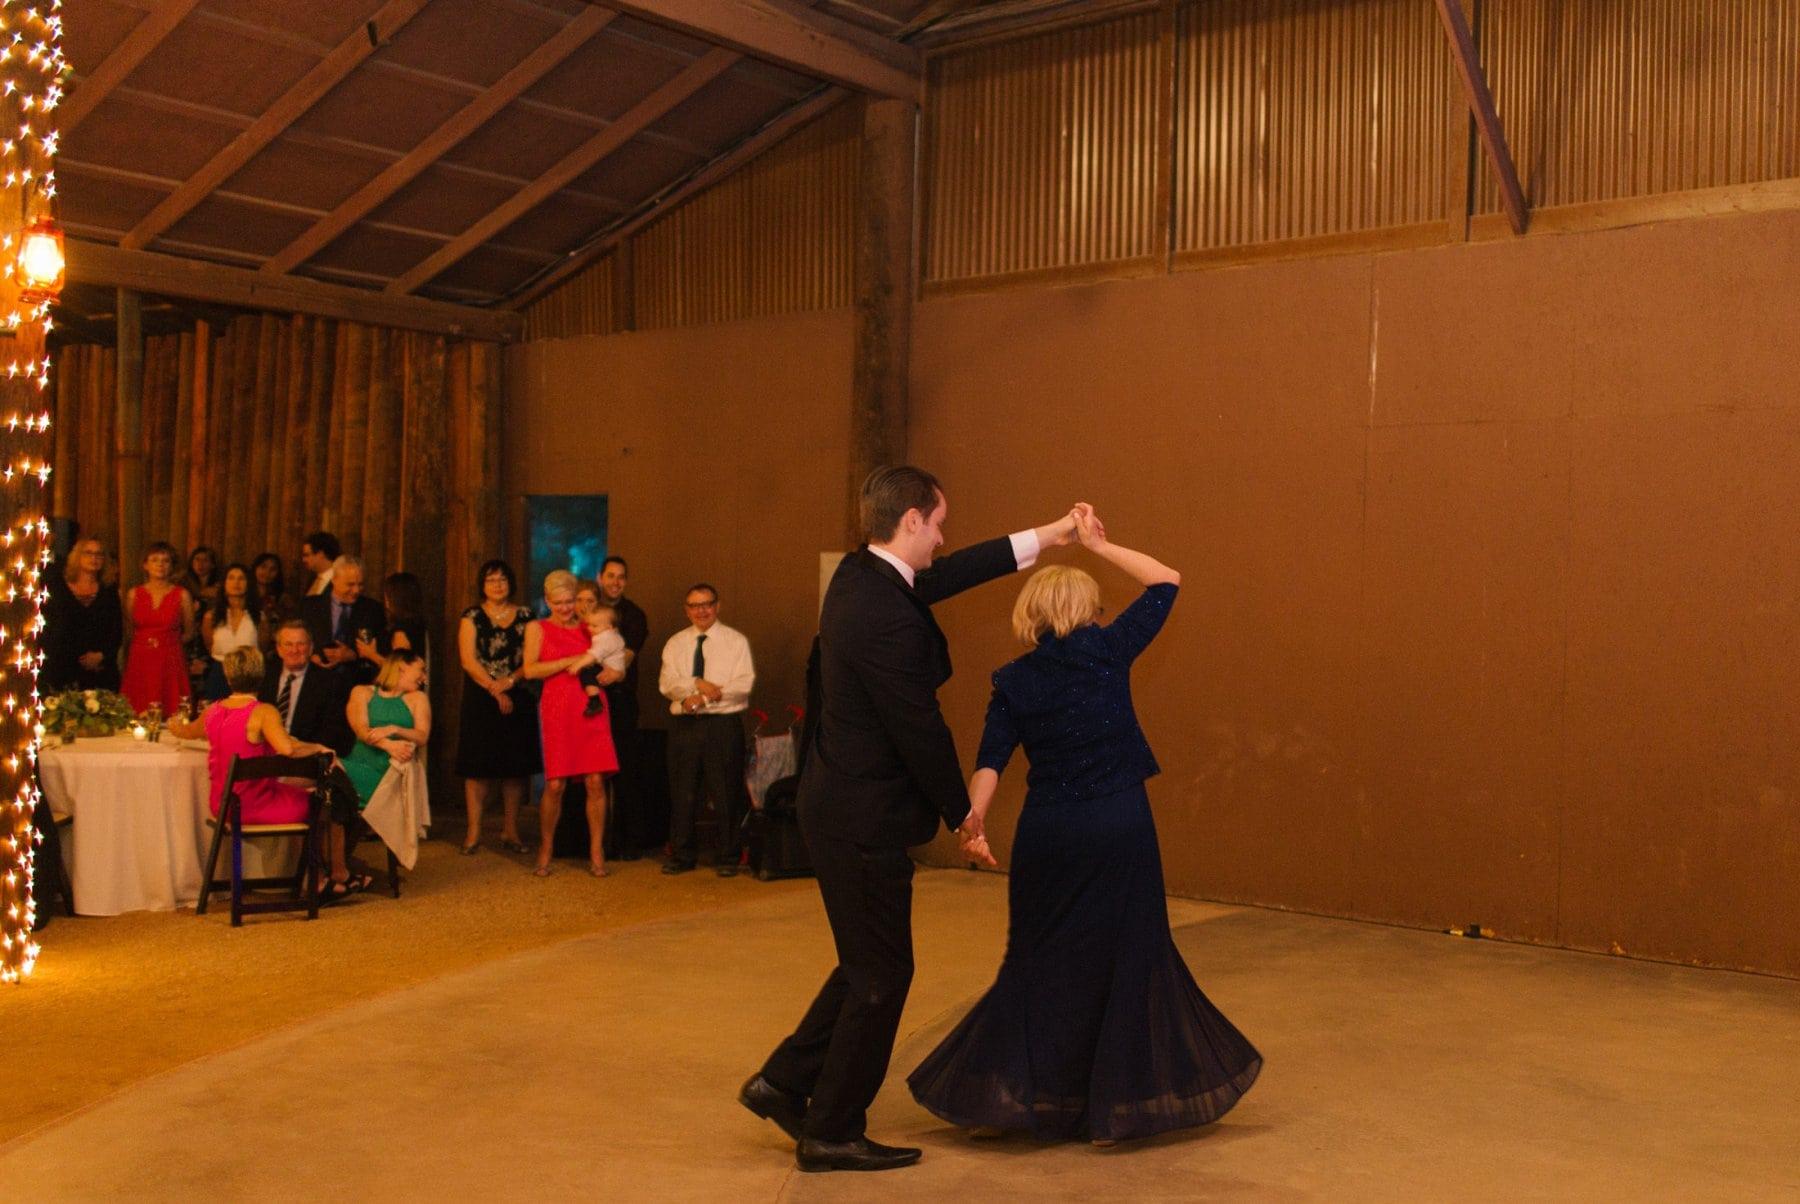 mother son dance Desert Foothills reception photos